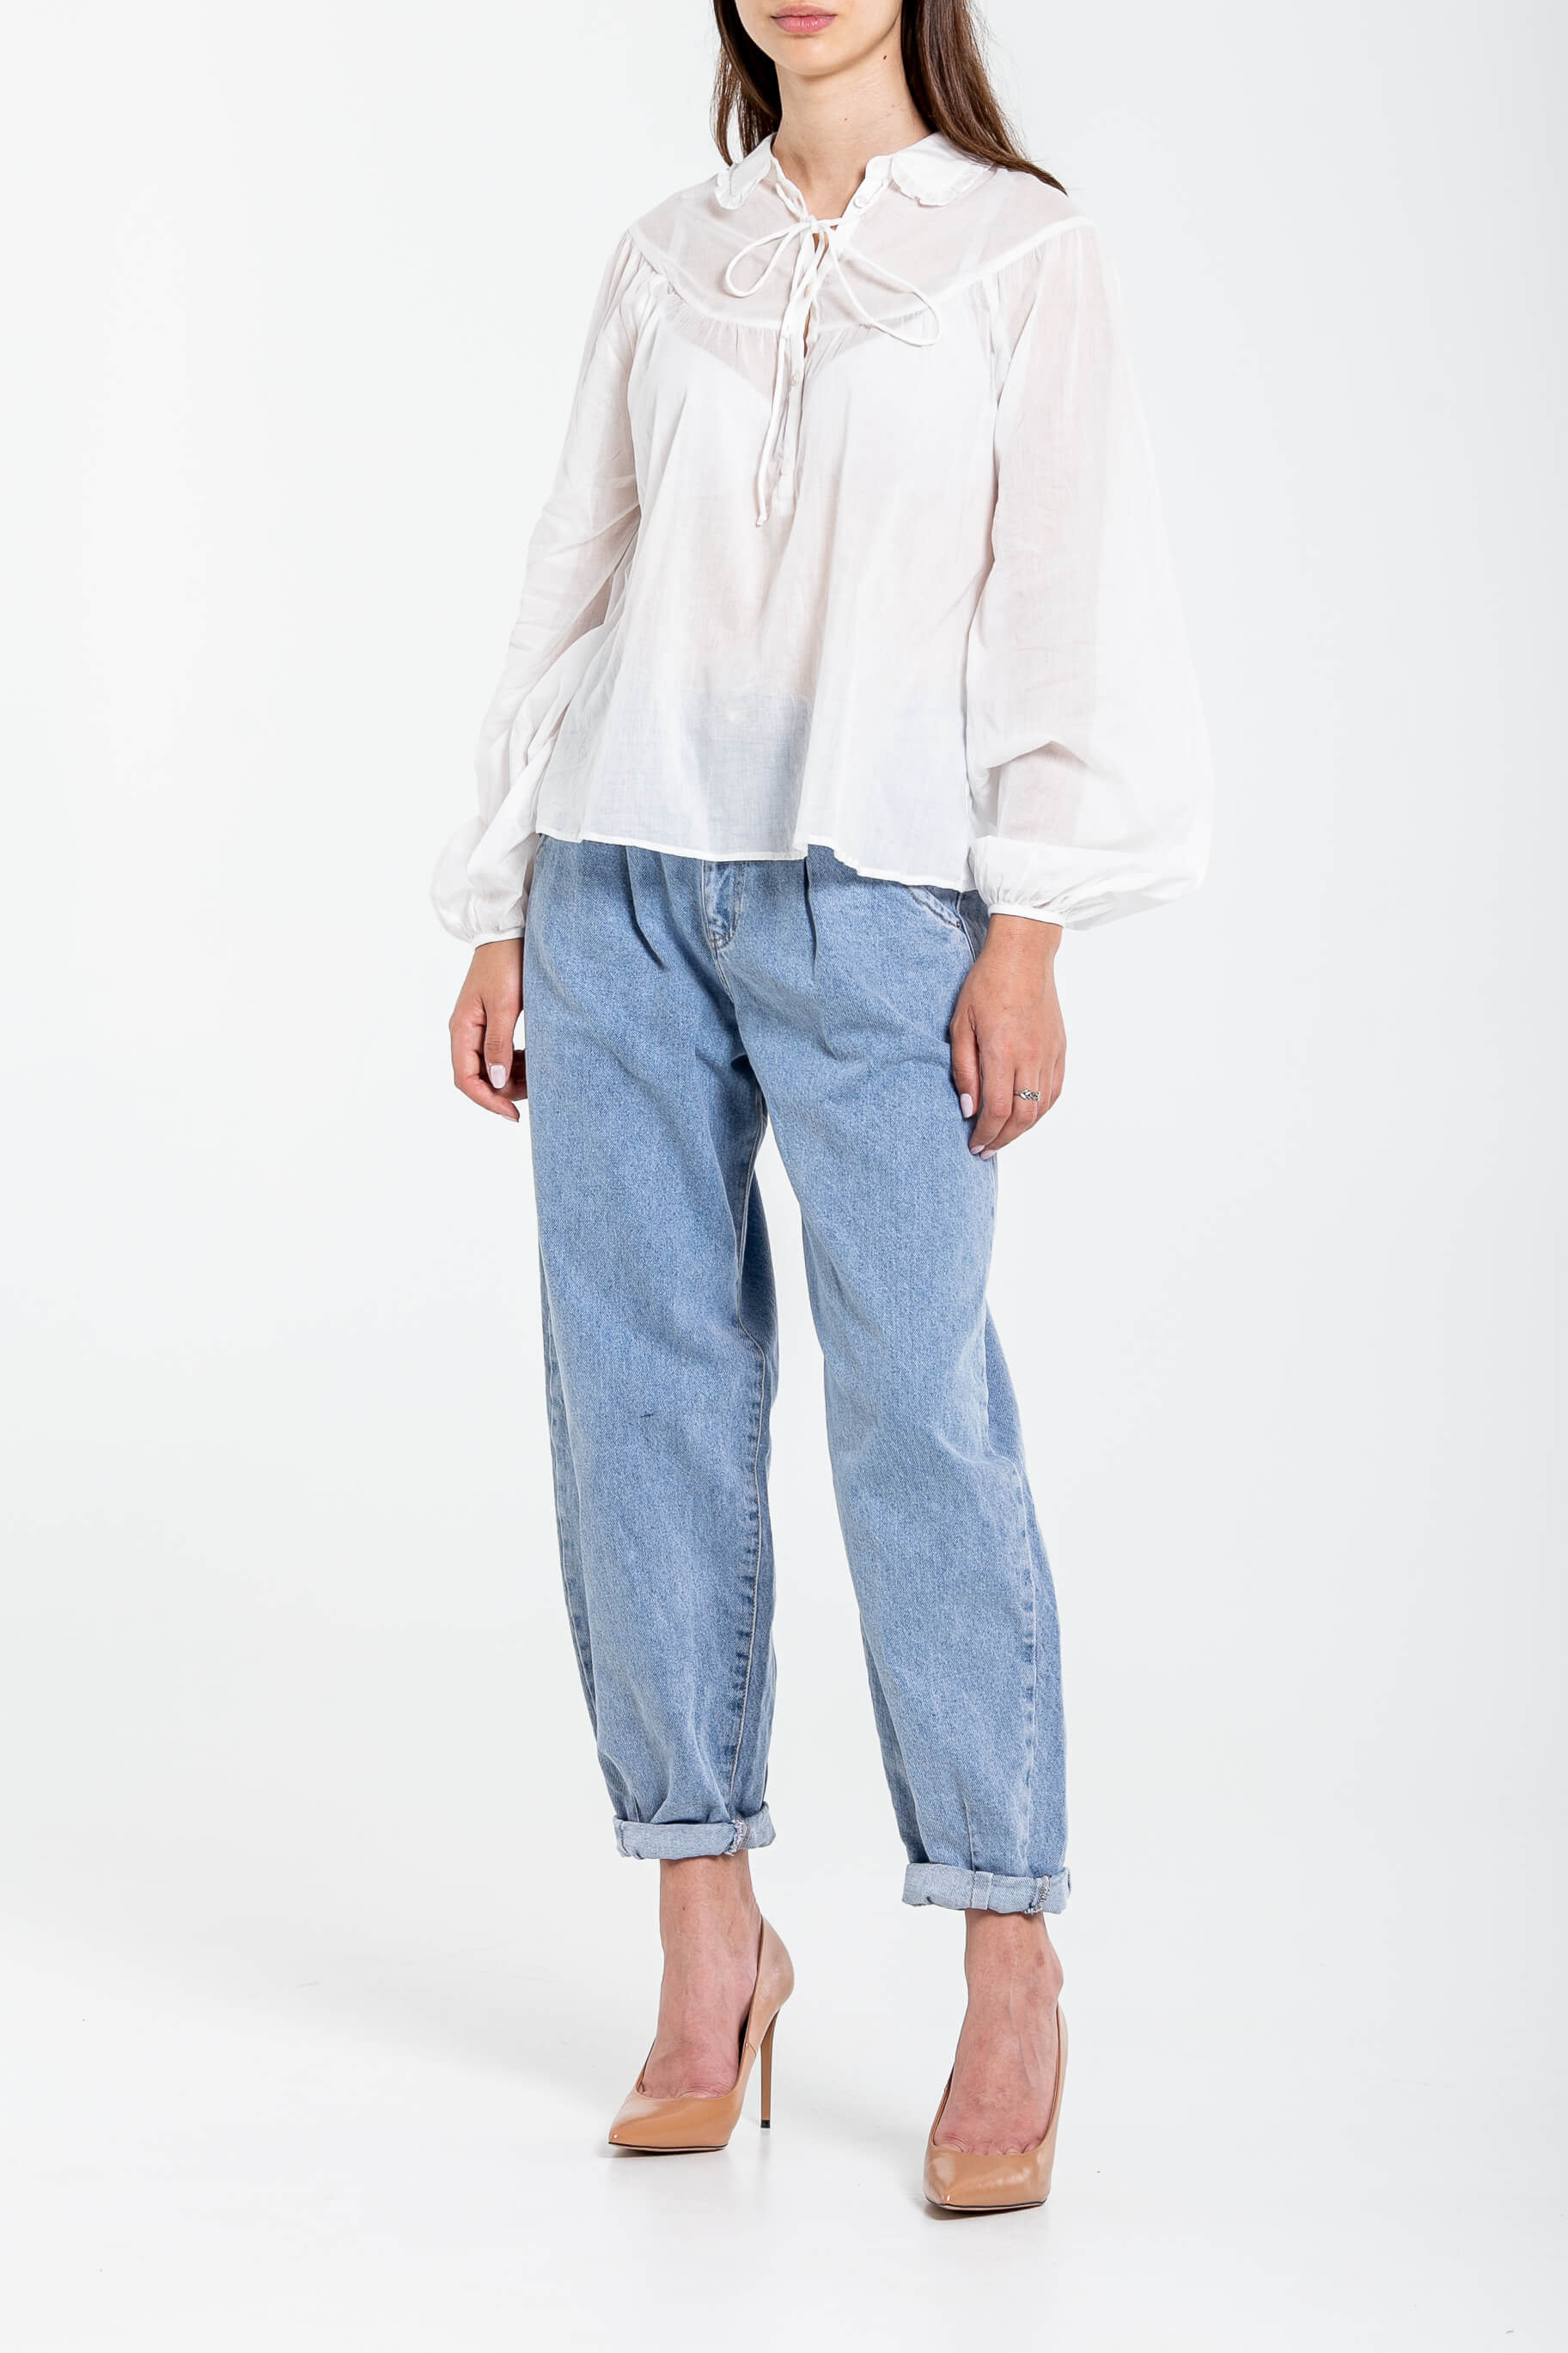 Блузка Richa Fashion Casual (1315) photo 0